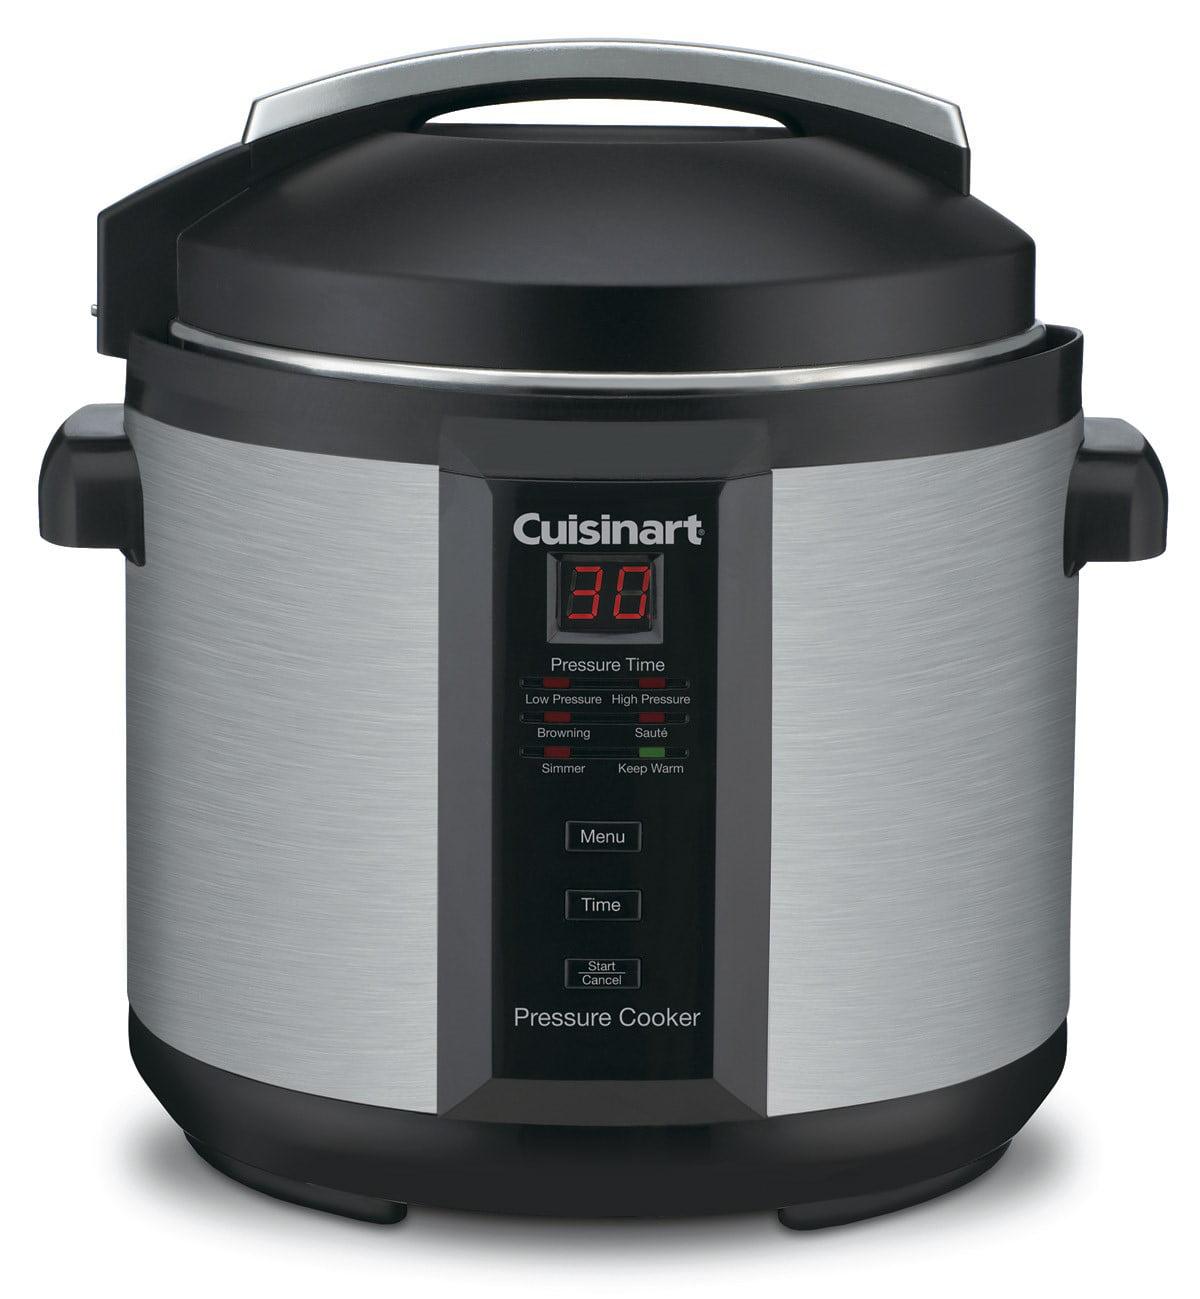 Cuisinart CPC-600 6-Qt. Electric Pressure Cooker One Size